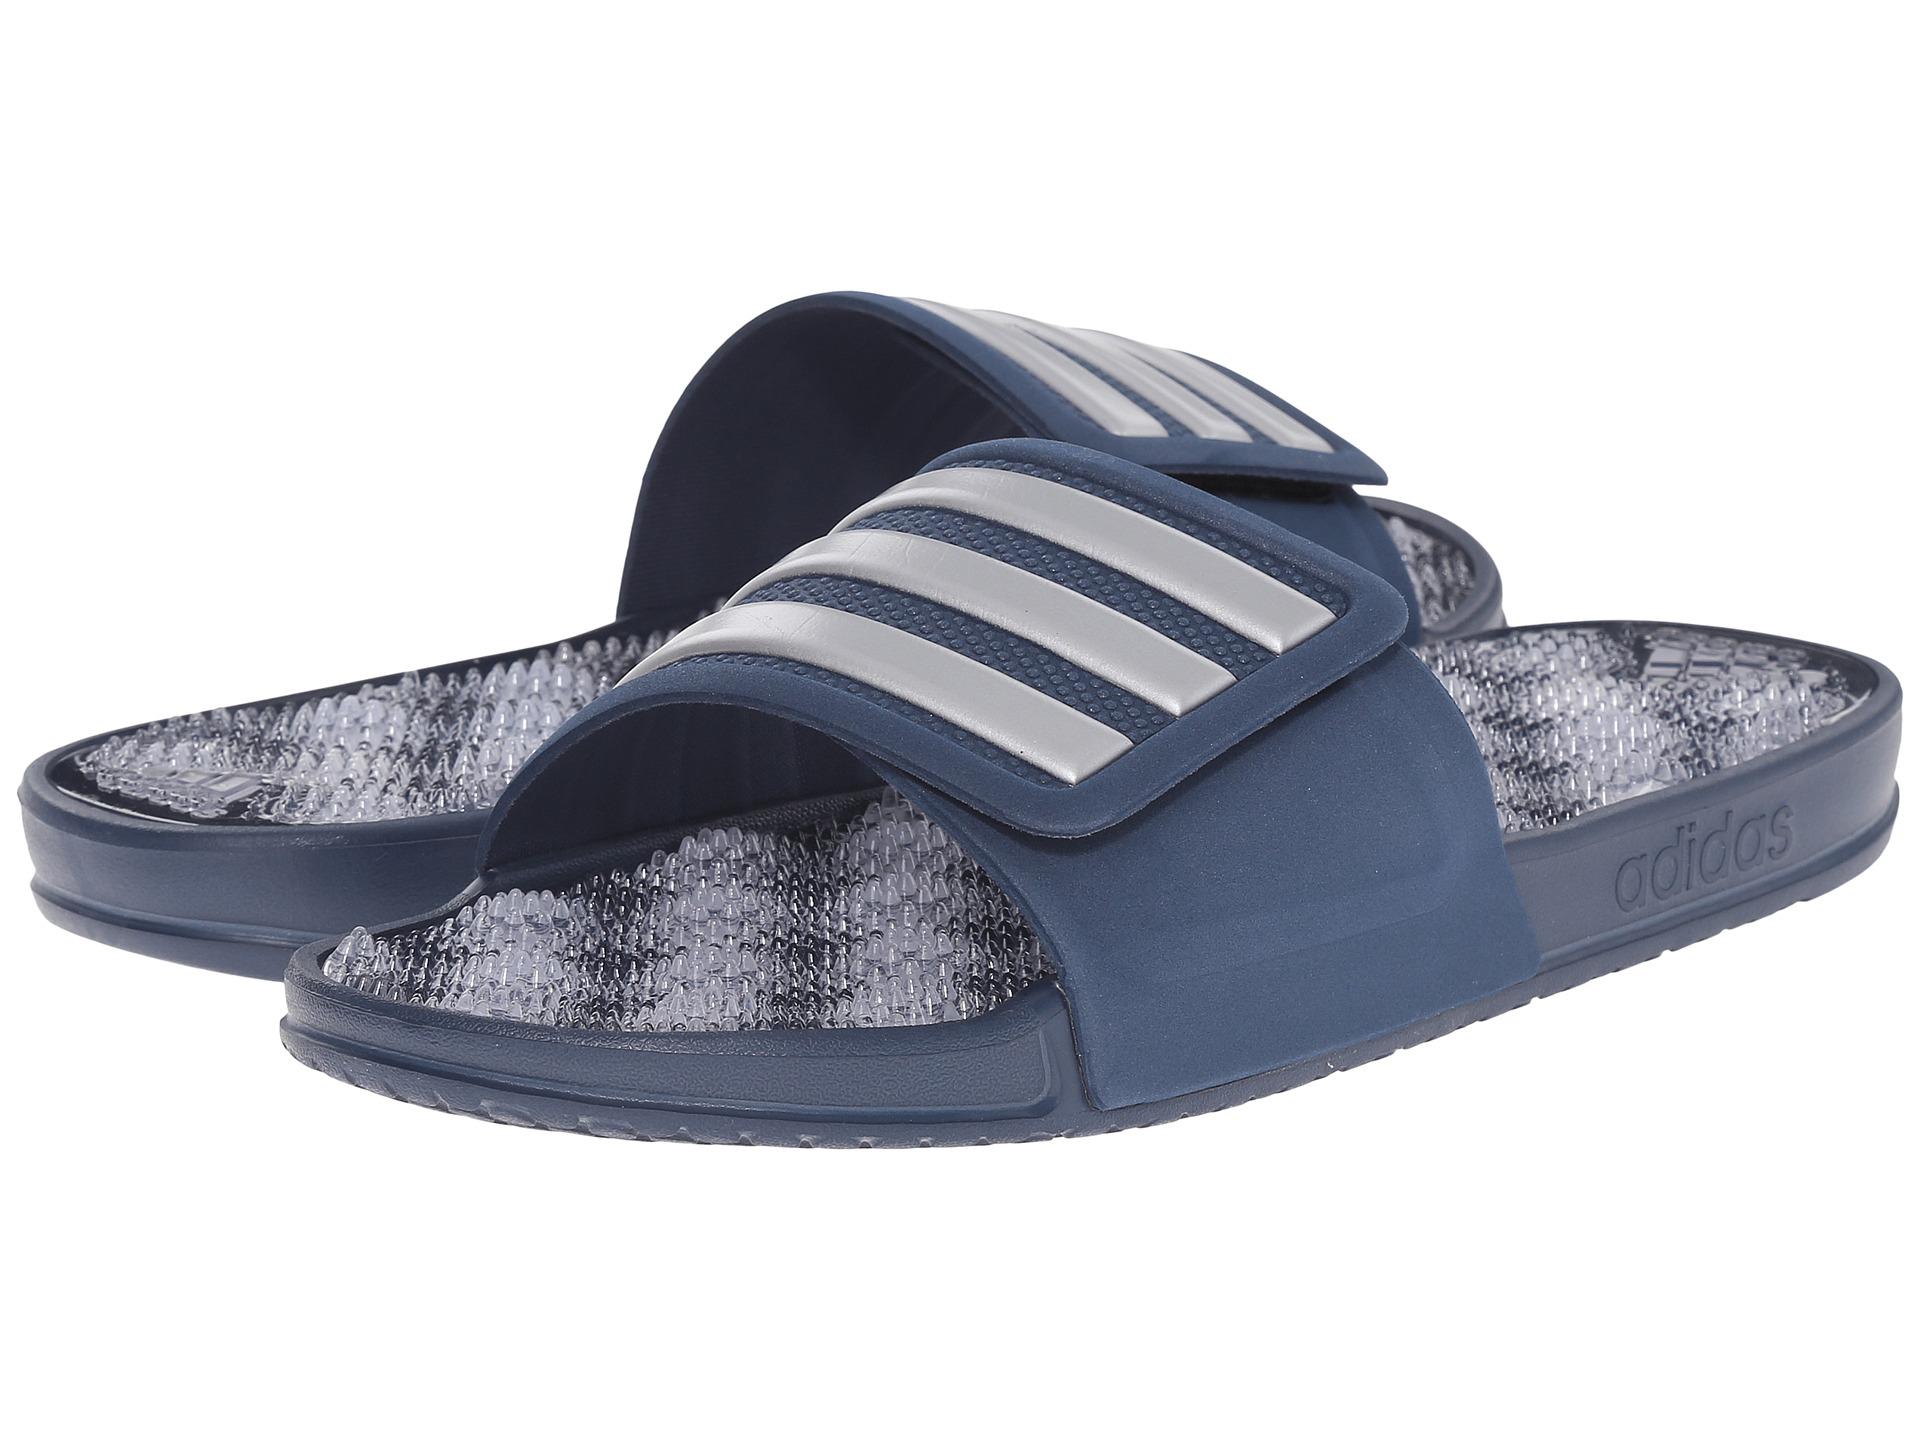 0d51298b140b Lyst - adidas Originals Adissage 2.0 M Stripe in Blue for Men